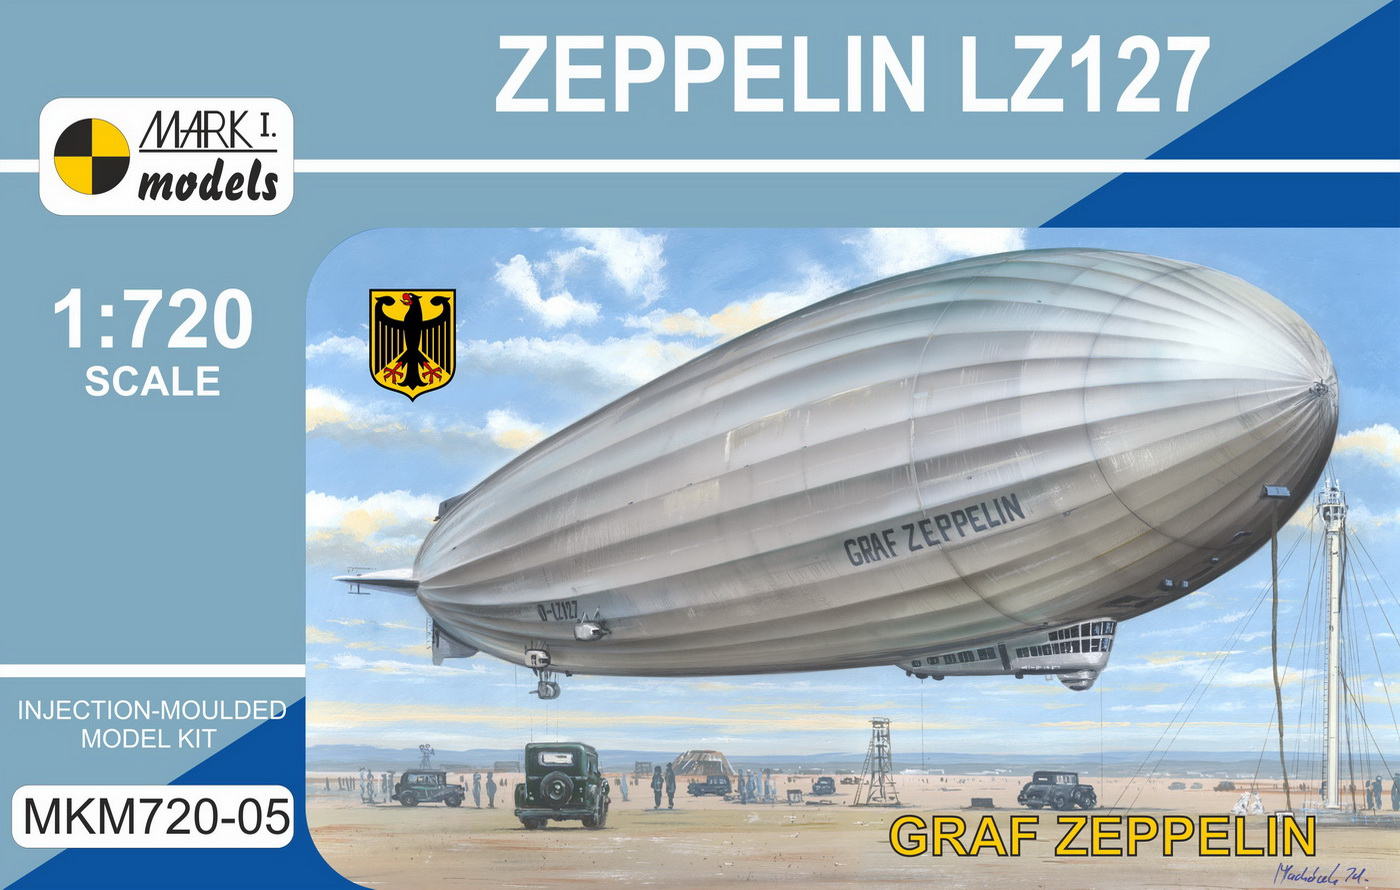 LZ 127 GRAF ZEPPELIN, 1/720, NOVINKA MARK I